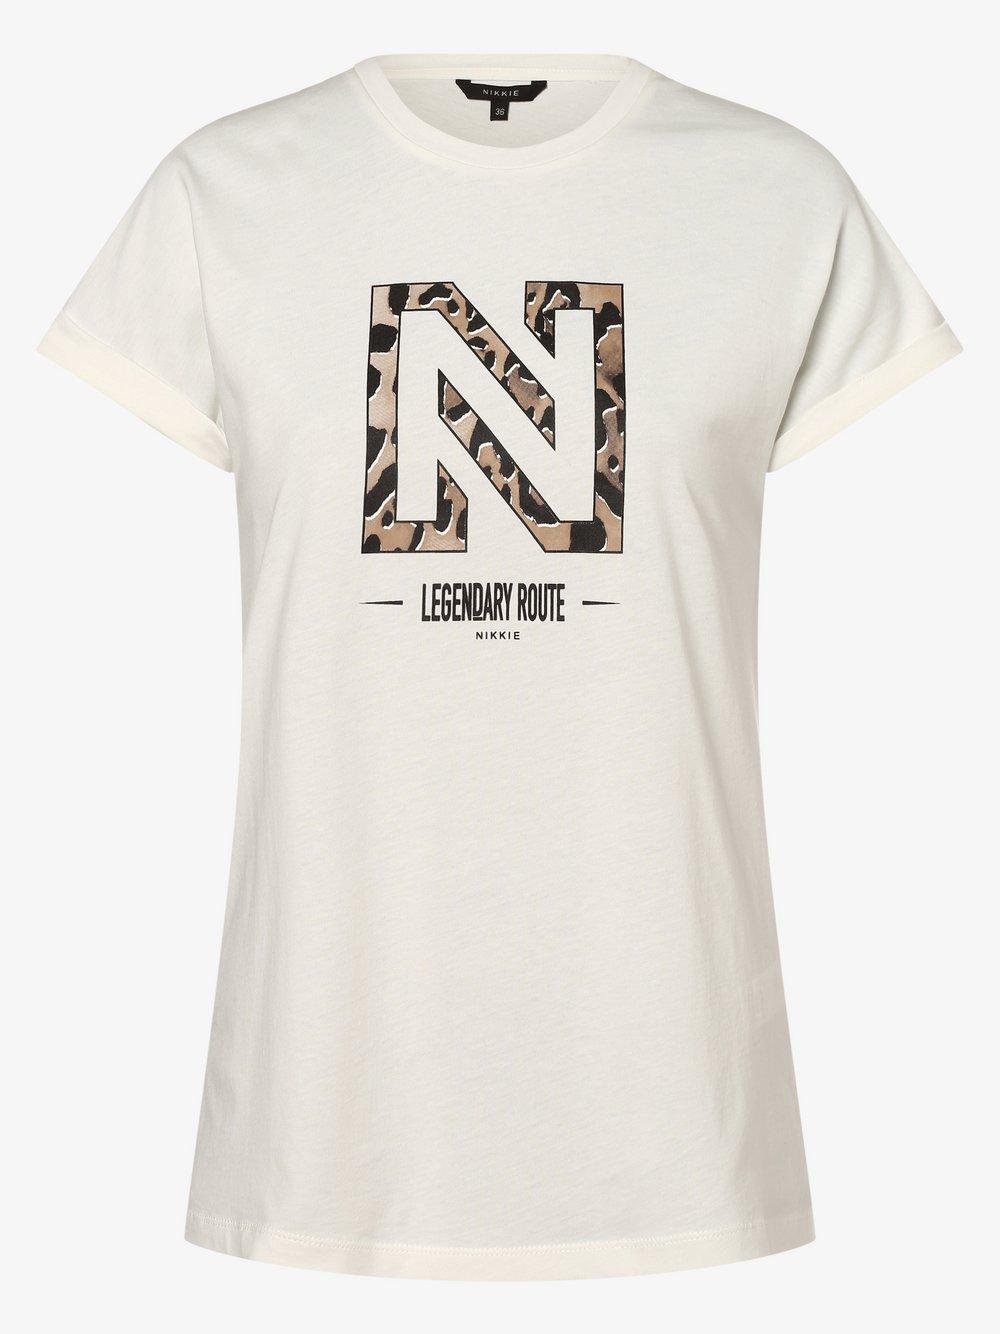 NIKKIE – T-shirt damski – Legendary, beżowy Van Graaf 477654-0001-00360